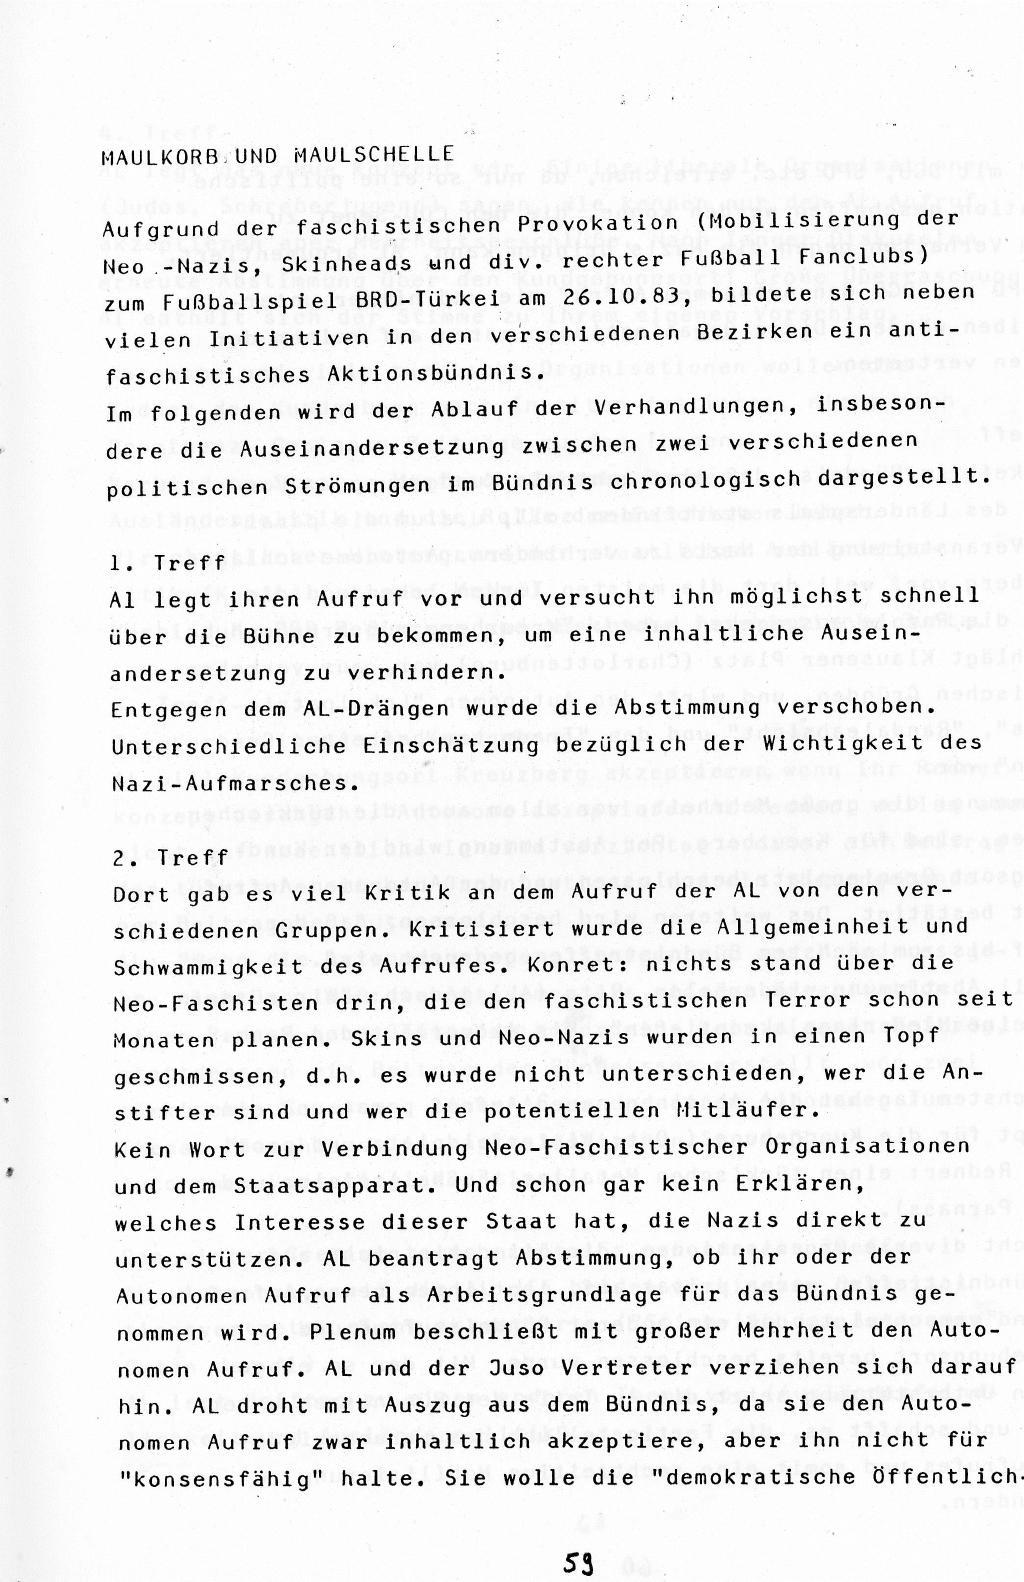 Berlin_1983_Autonome_Gruppen_Faschismus_im_Kapitalismus_59